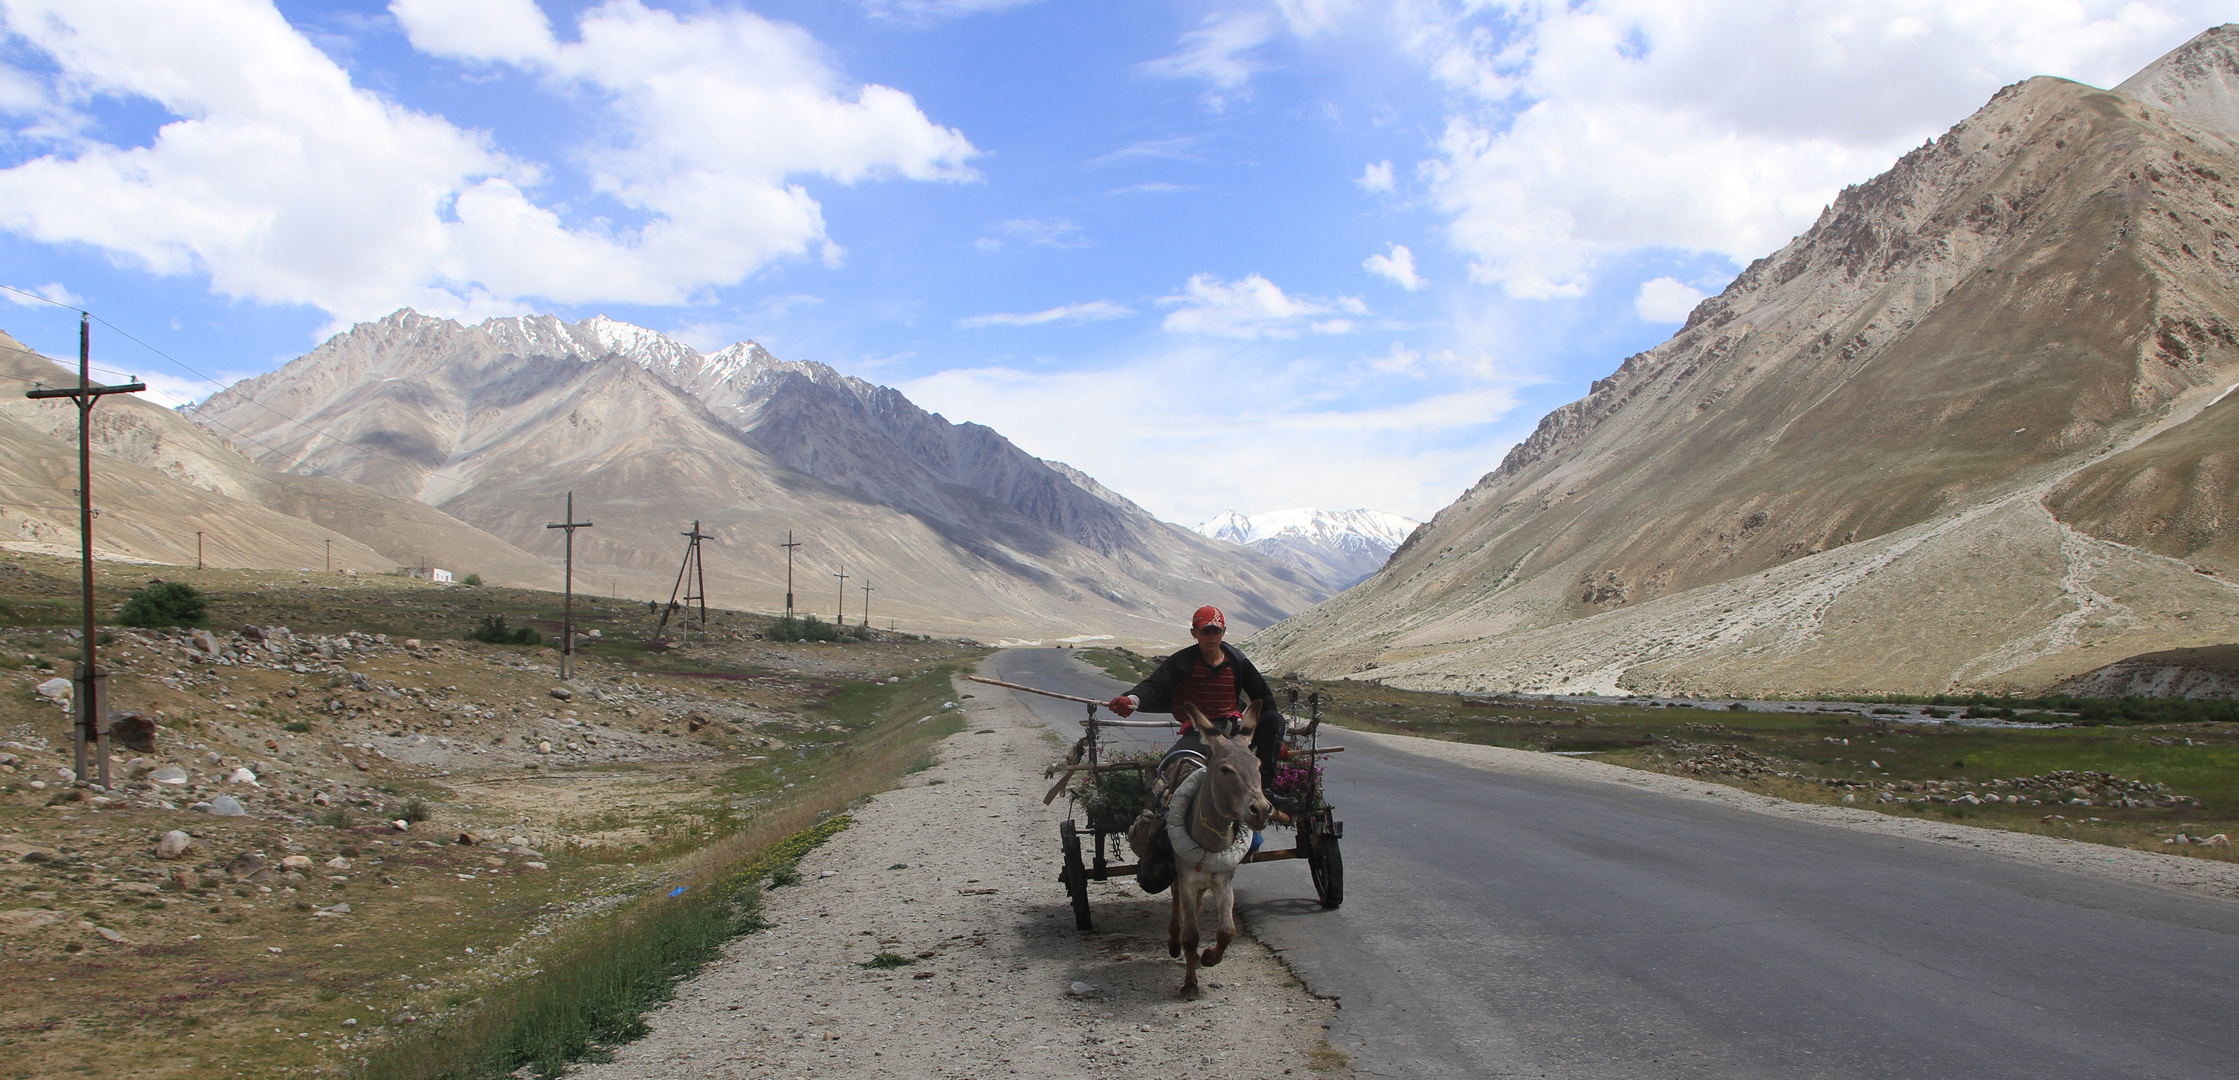 Donkeys of the Pamir VIII